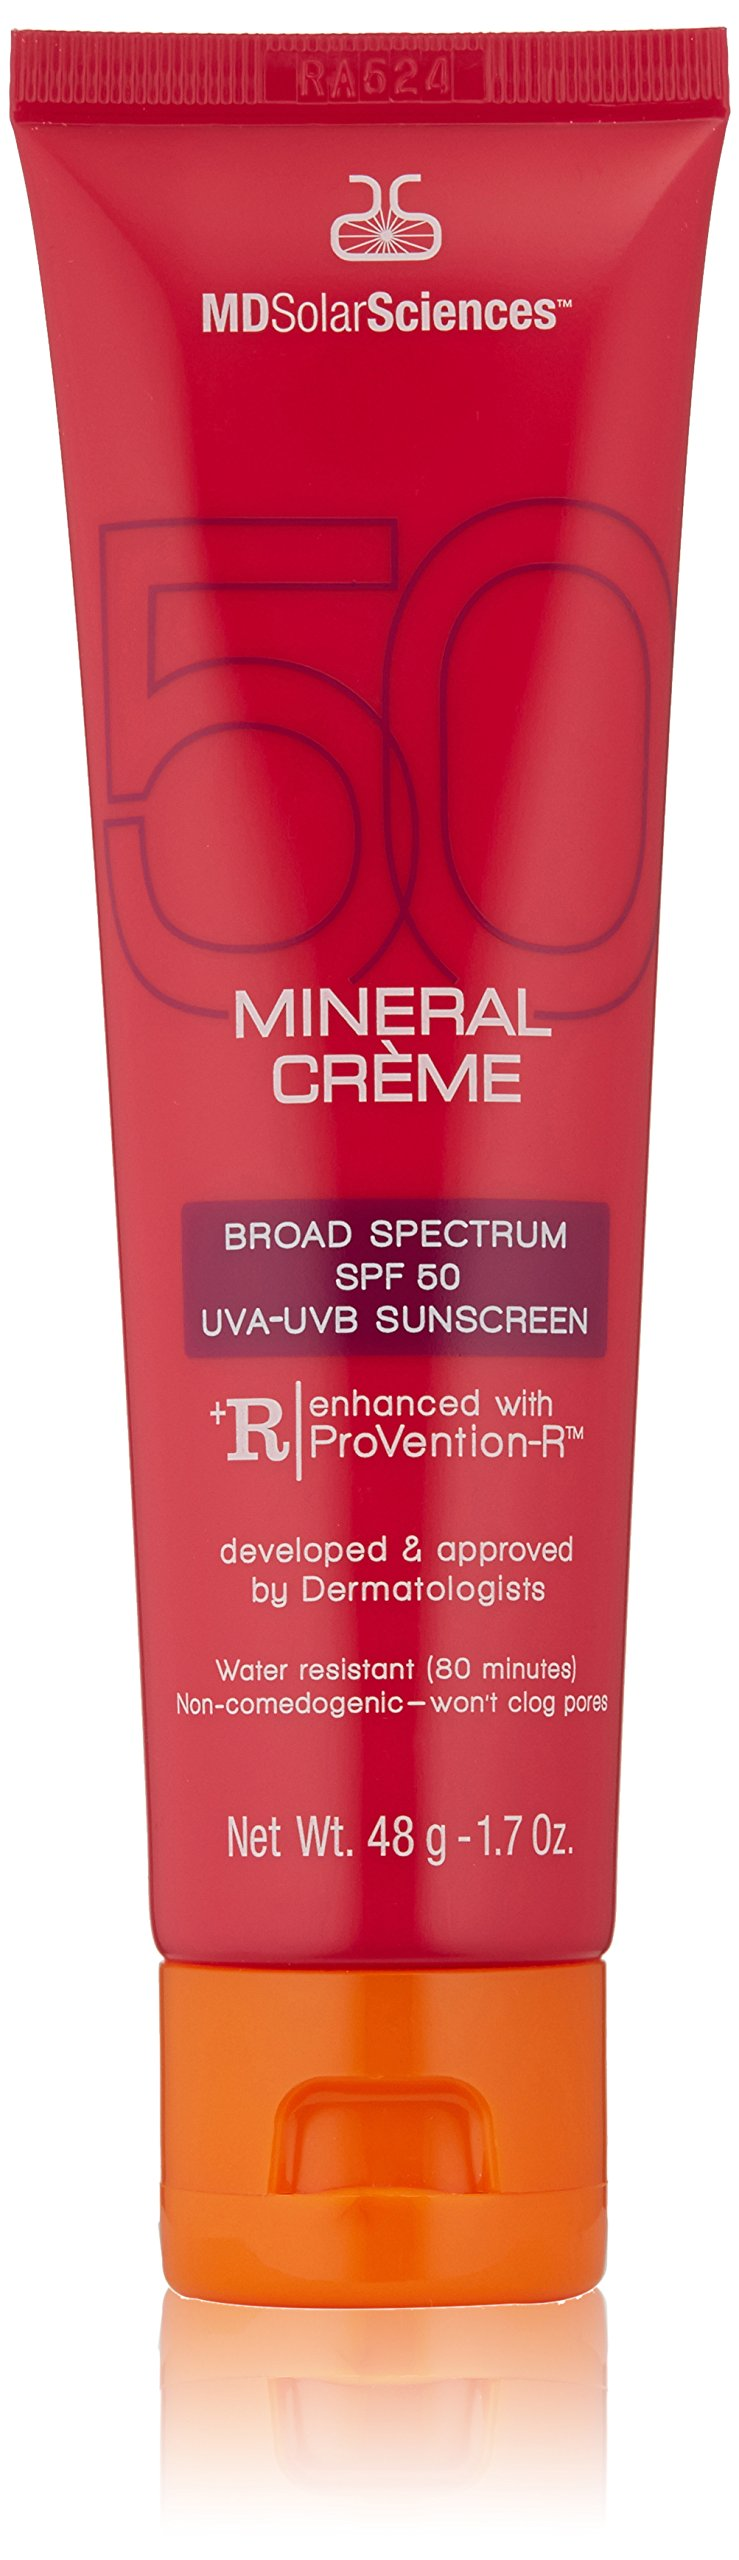 MDSolarSciences Mineral Crème Broad Spectrum SPF 50